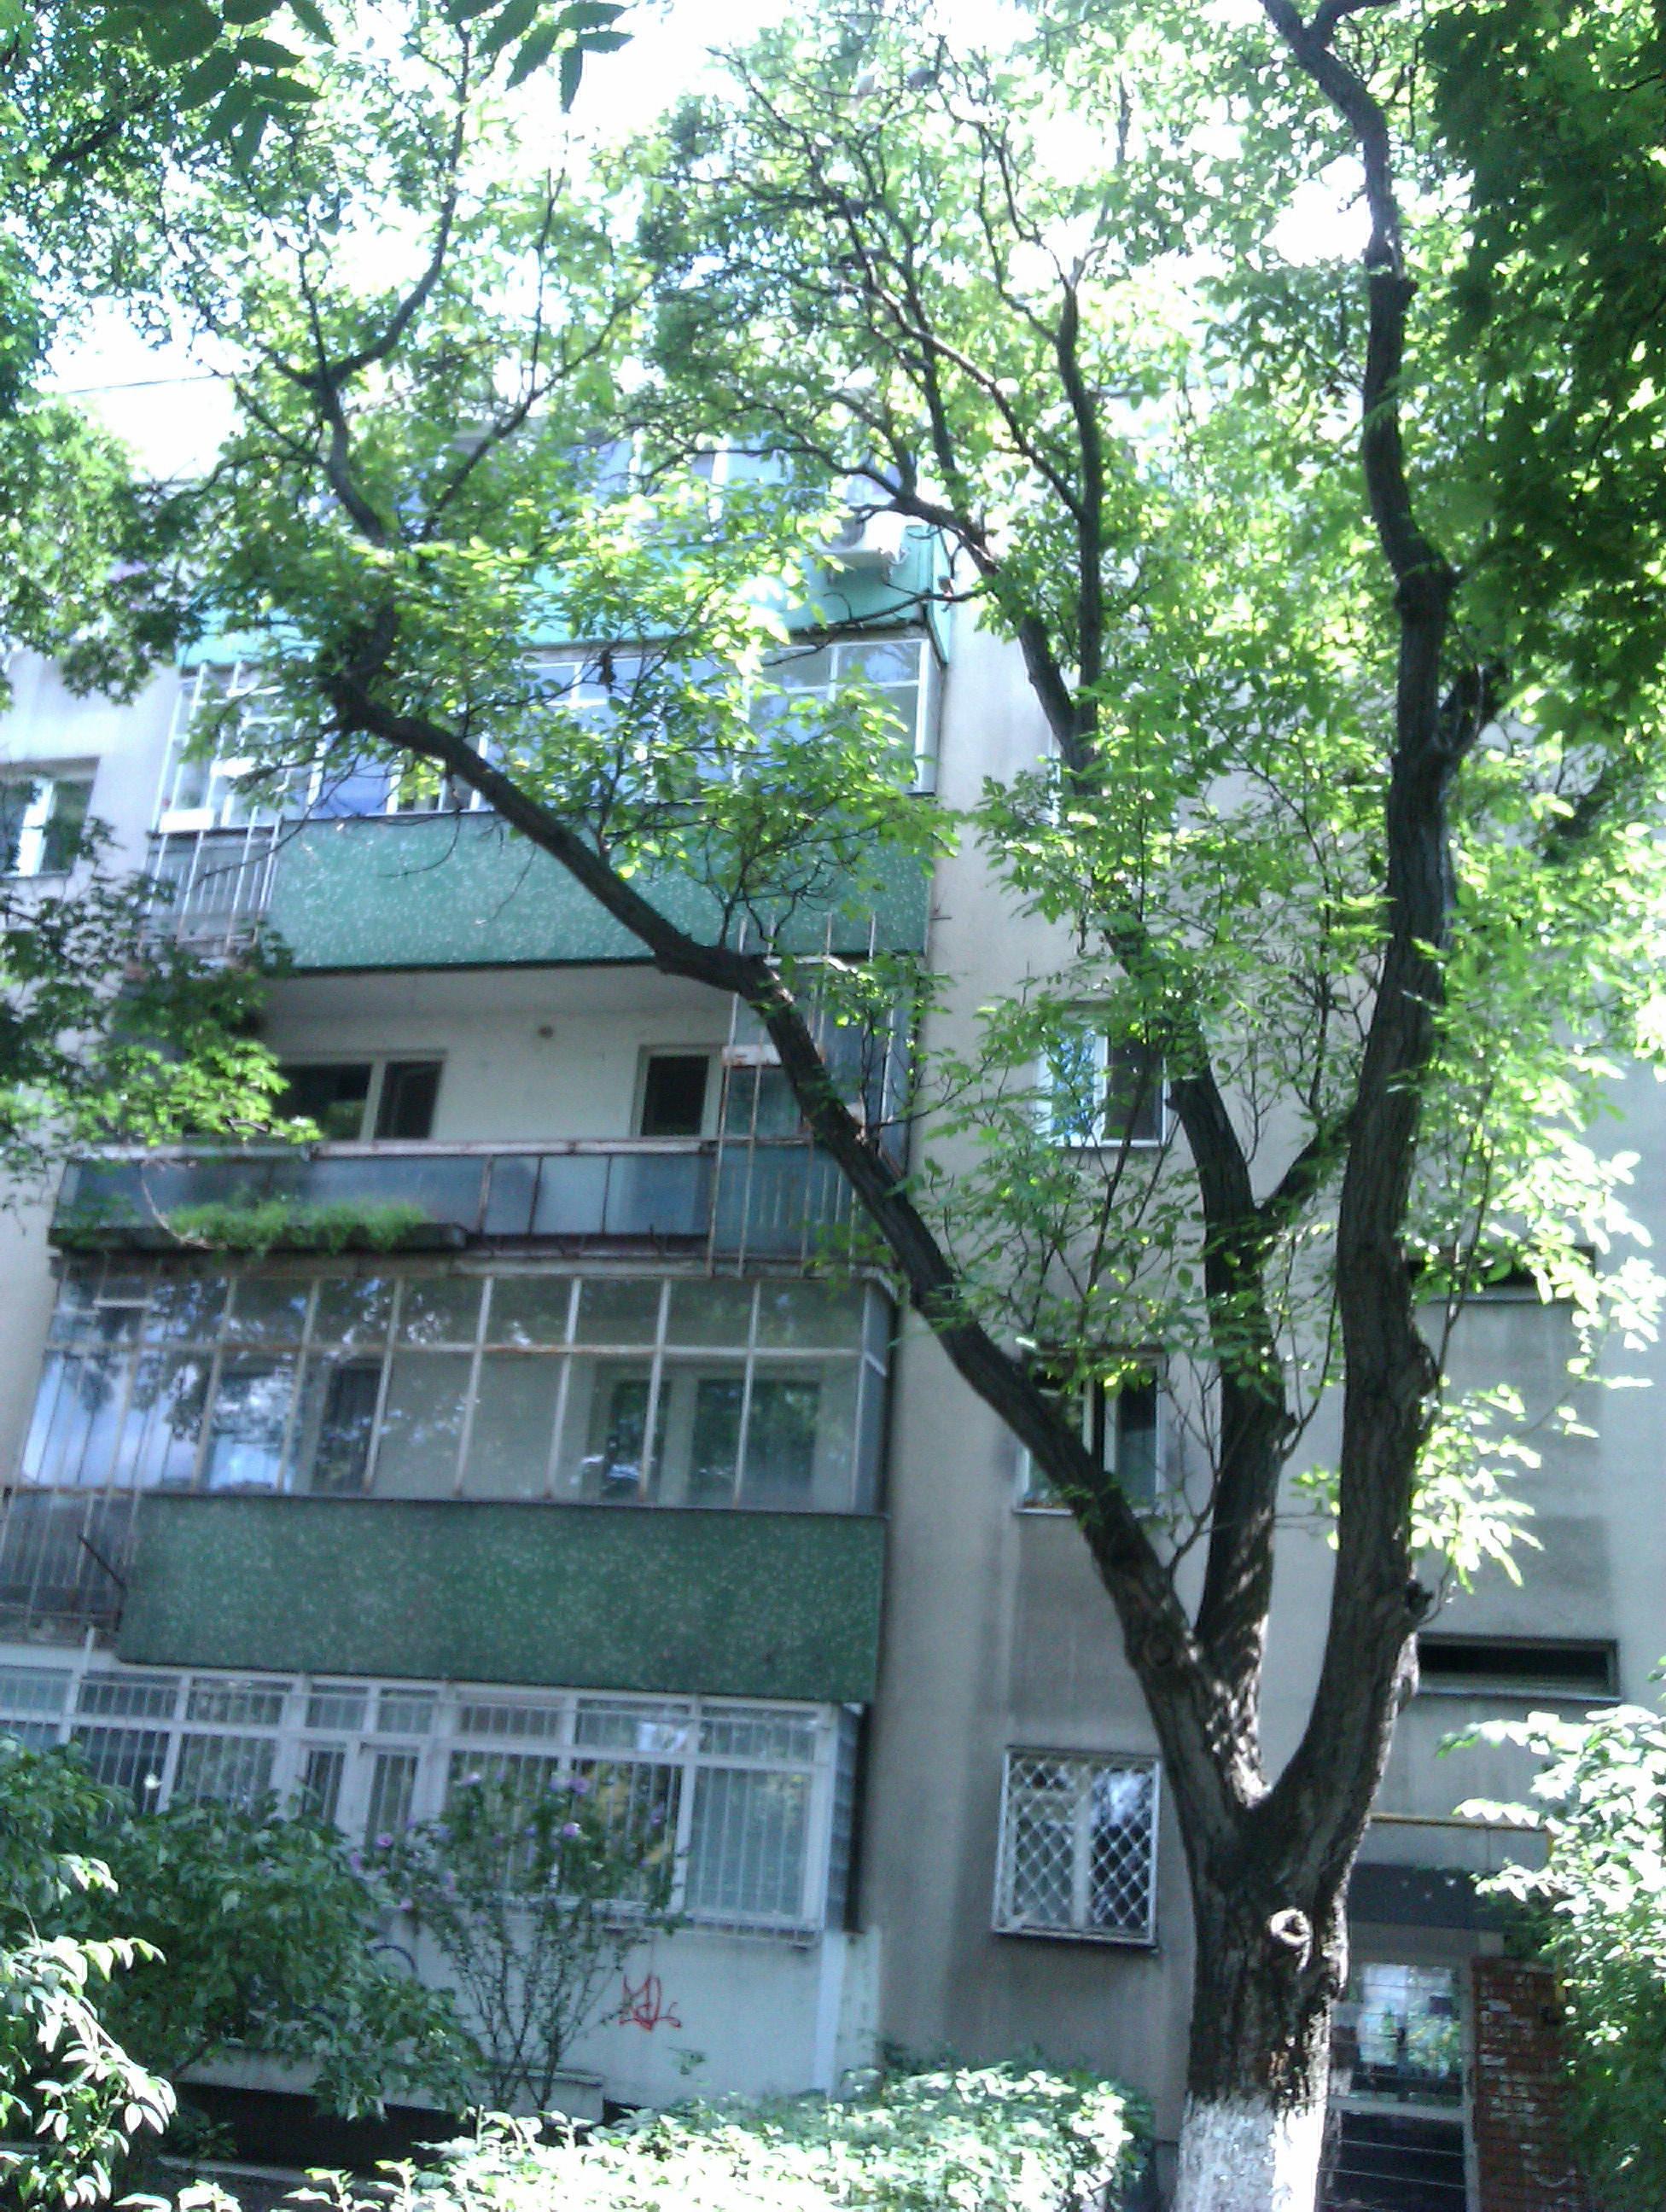 Acesta este blocul in care locuieste Gheorghe Marmureanu